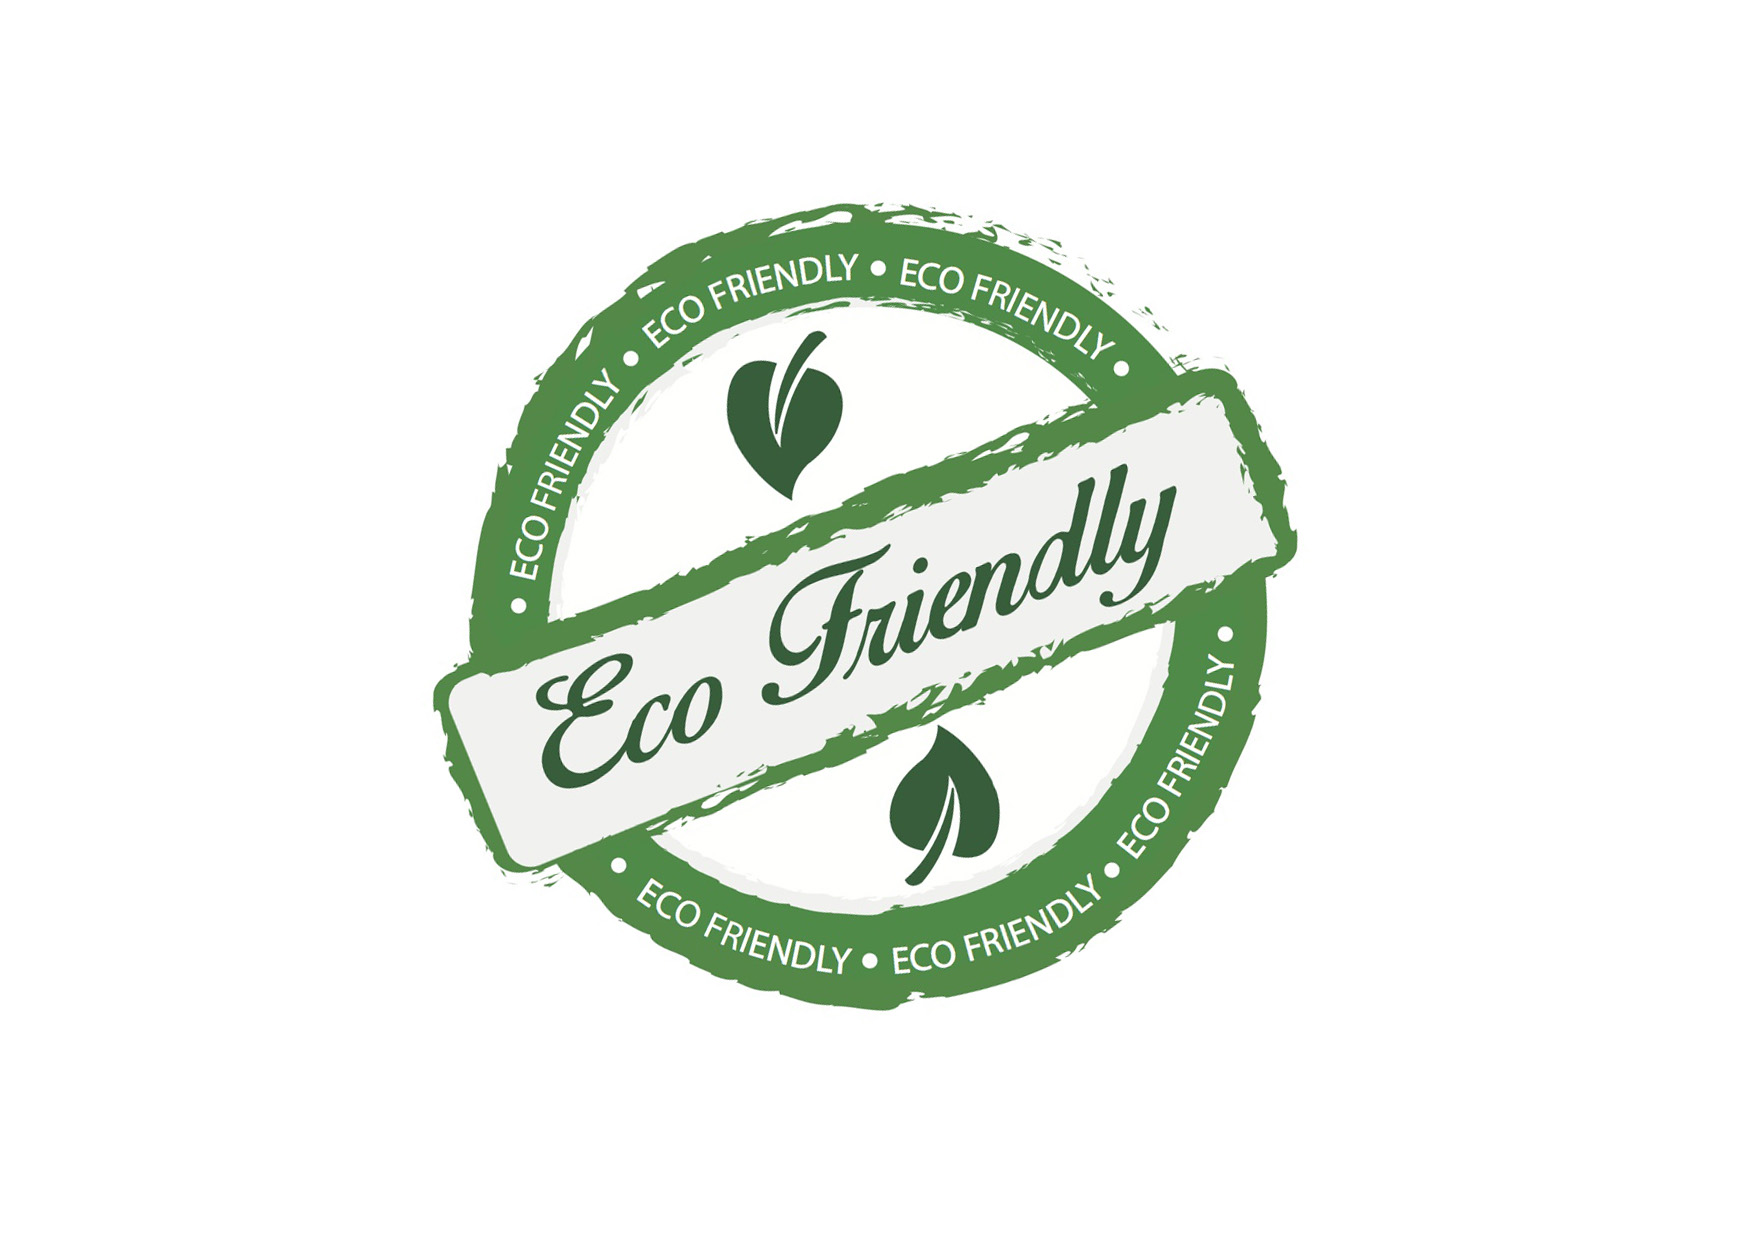 Eco pic tilt